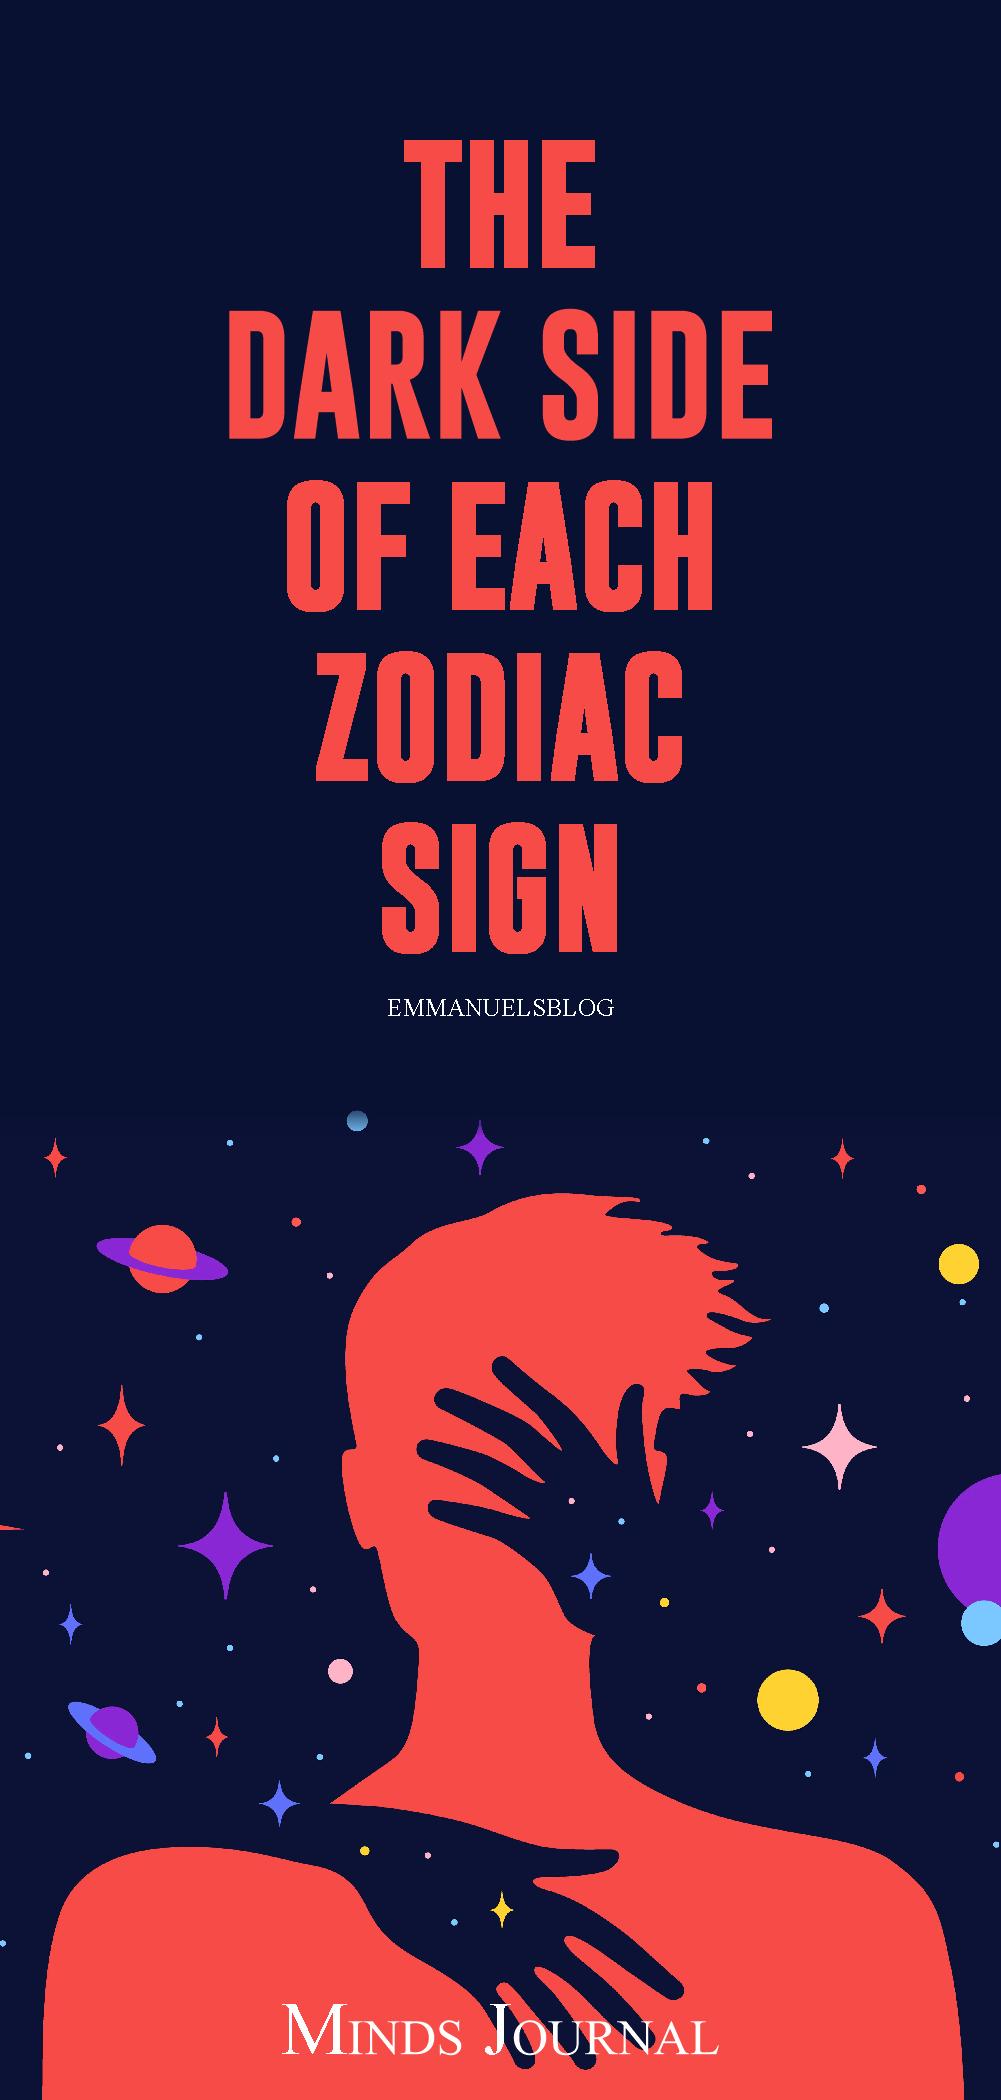 The Dark Side of each Zodiac Sign Revealed